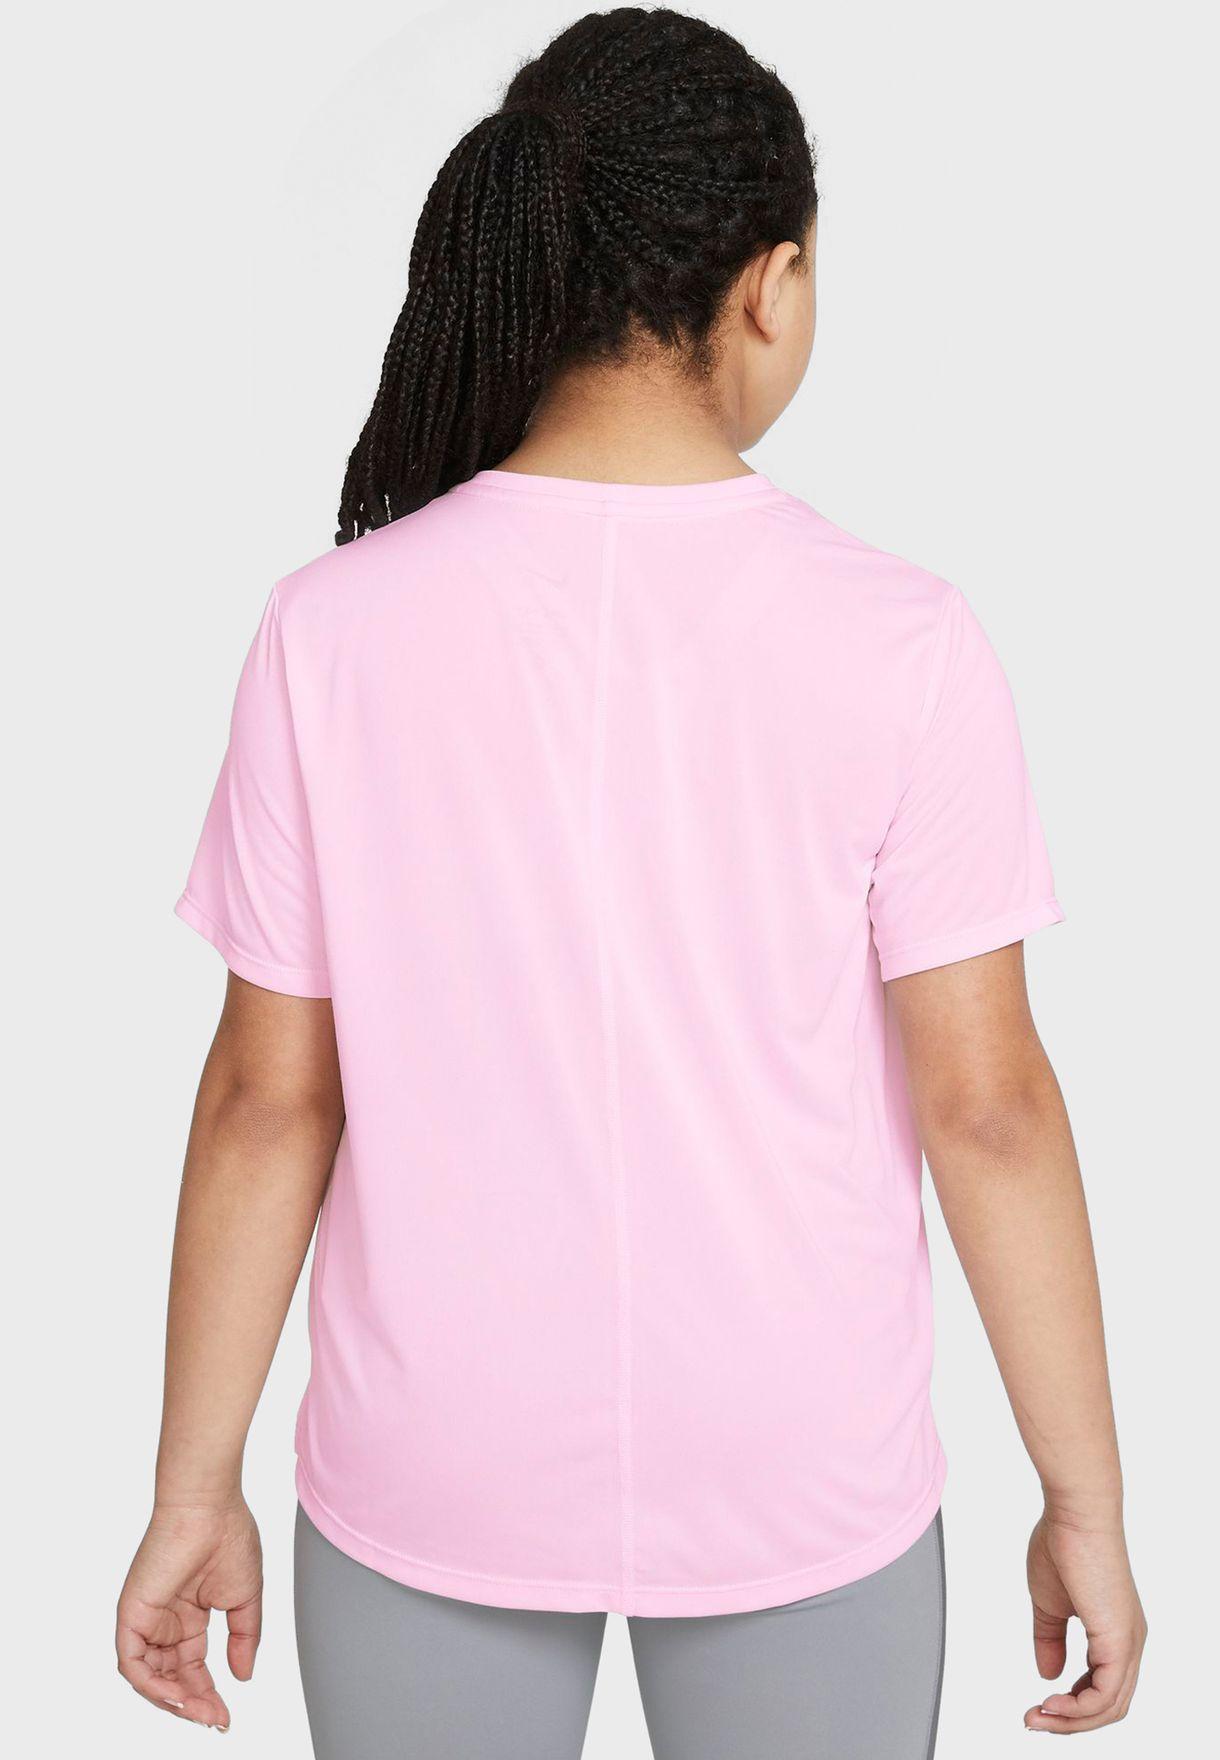 Youth Dri-Fit T-Shirt